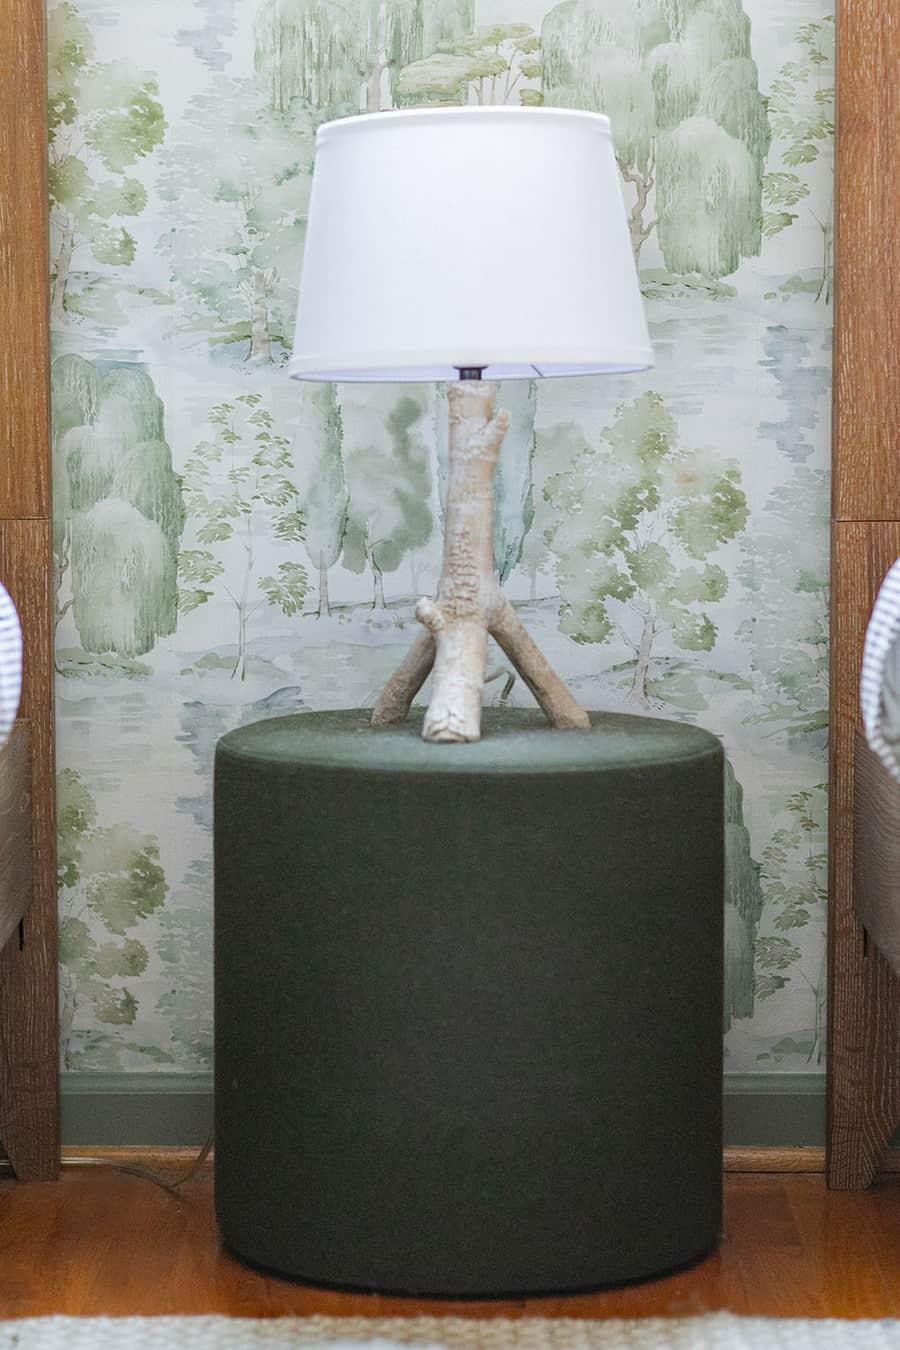 Birch lamp from Pottery barn kids